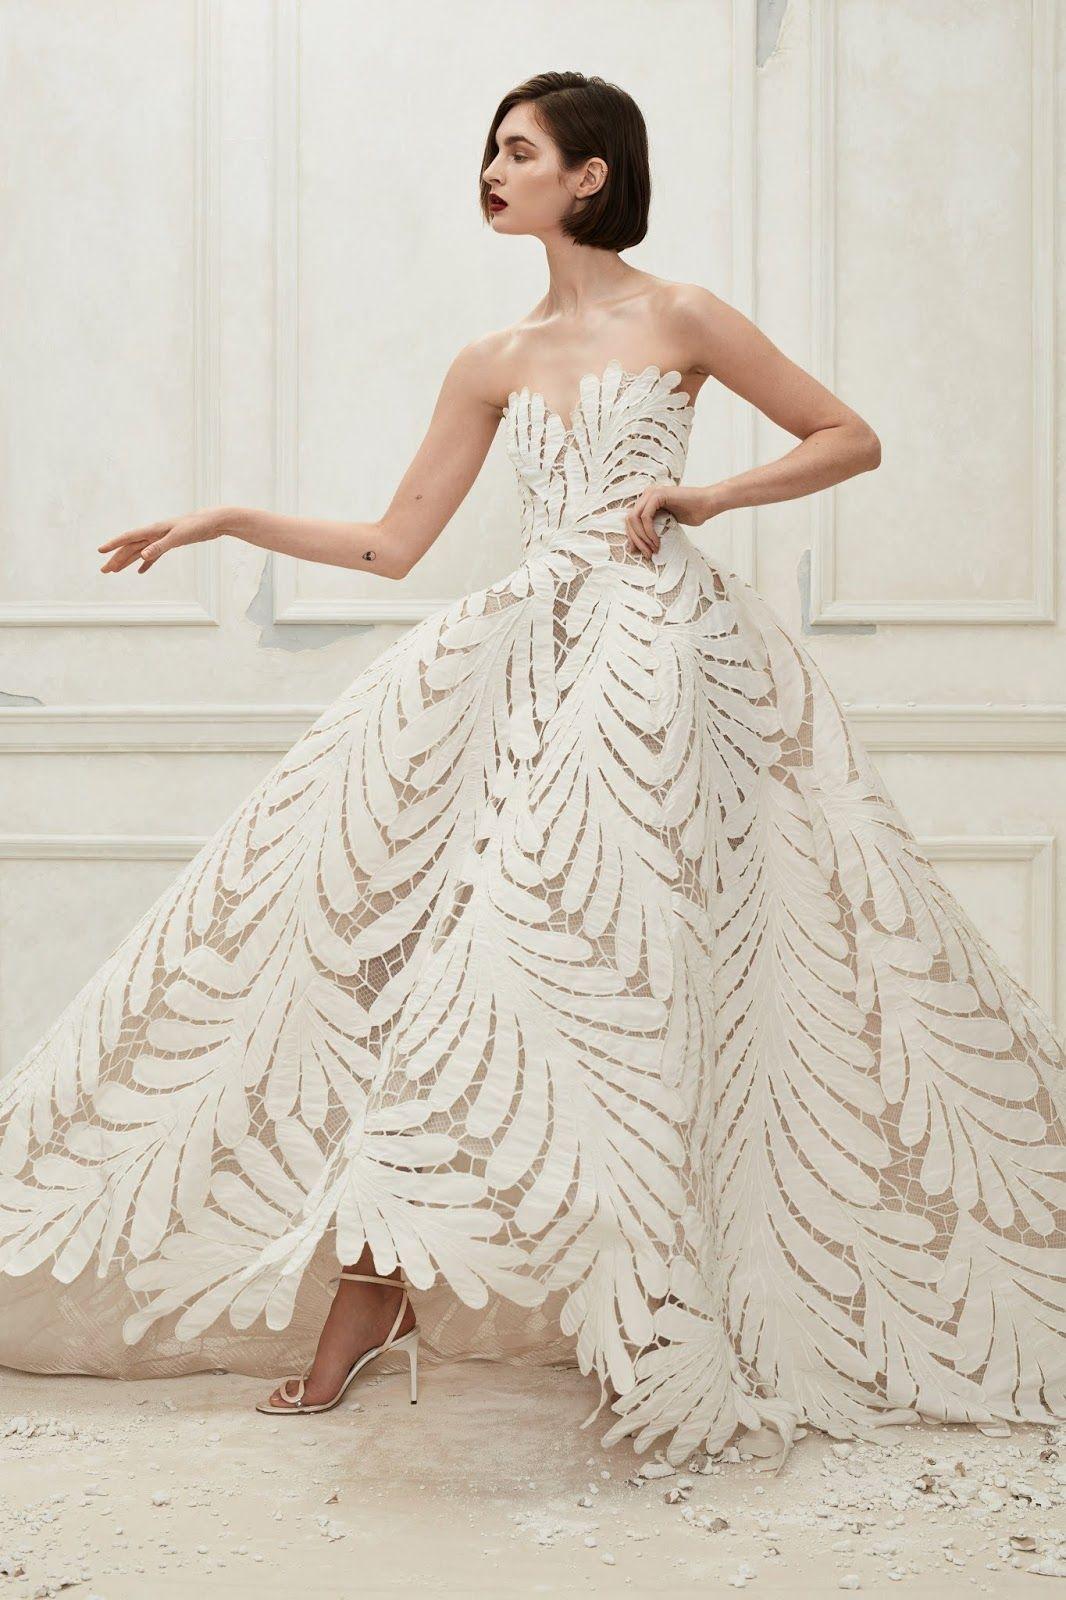 Bridal Elegance Oscar de la Renta October    Dream Wedding